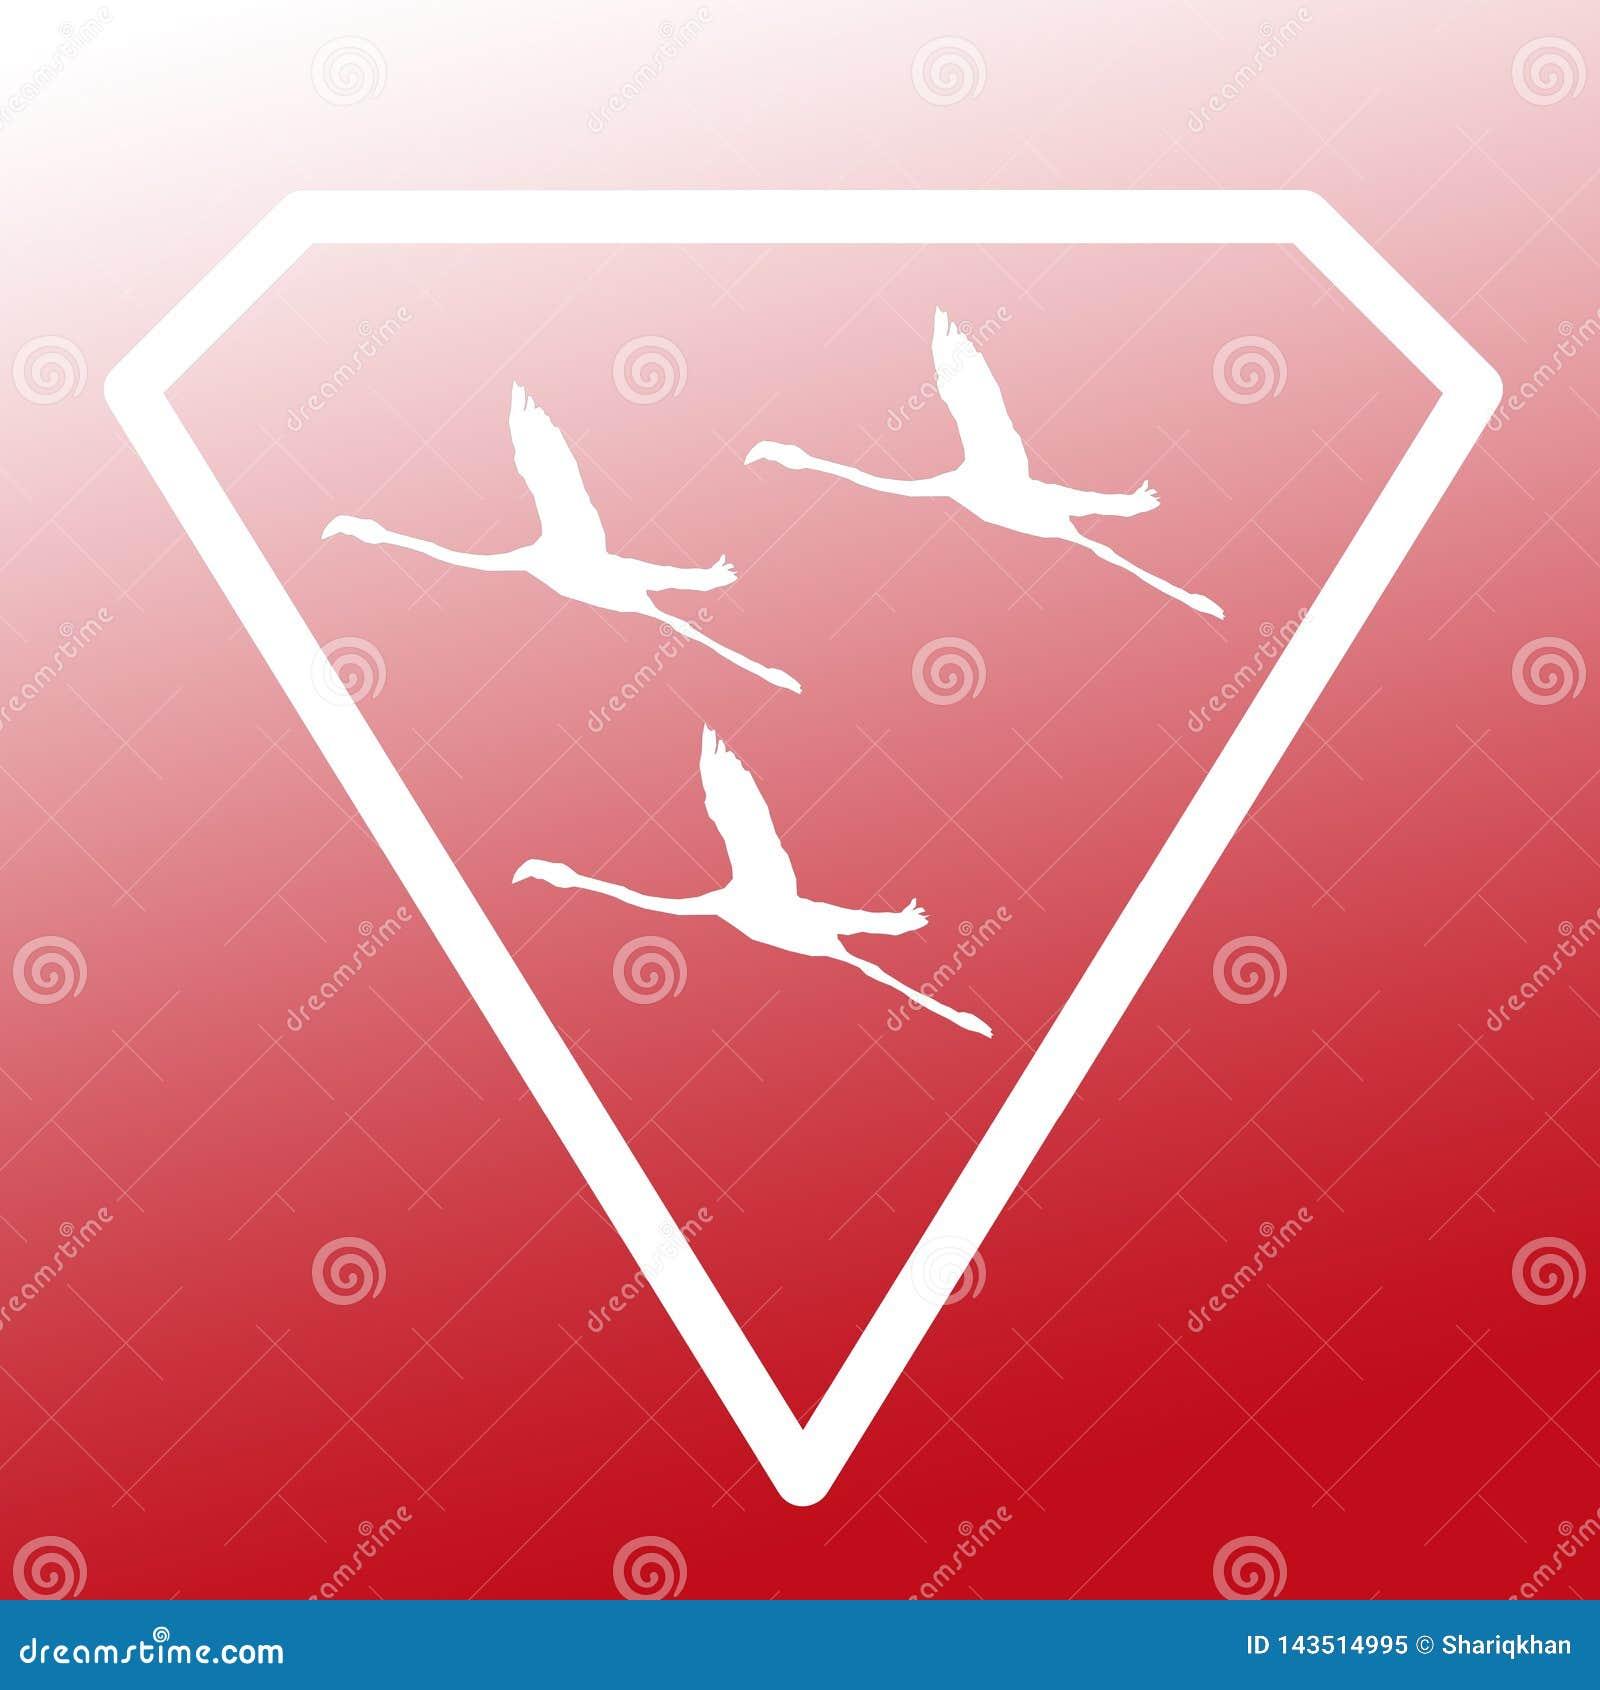 Pájaros de Logo Banner Image Flying Flamingo en Diamond Shape en fondo rojo